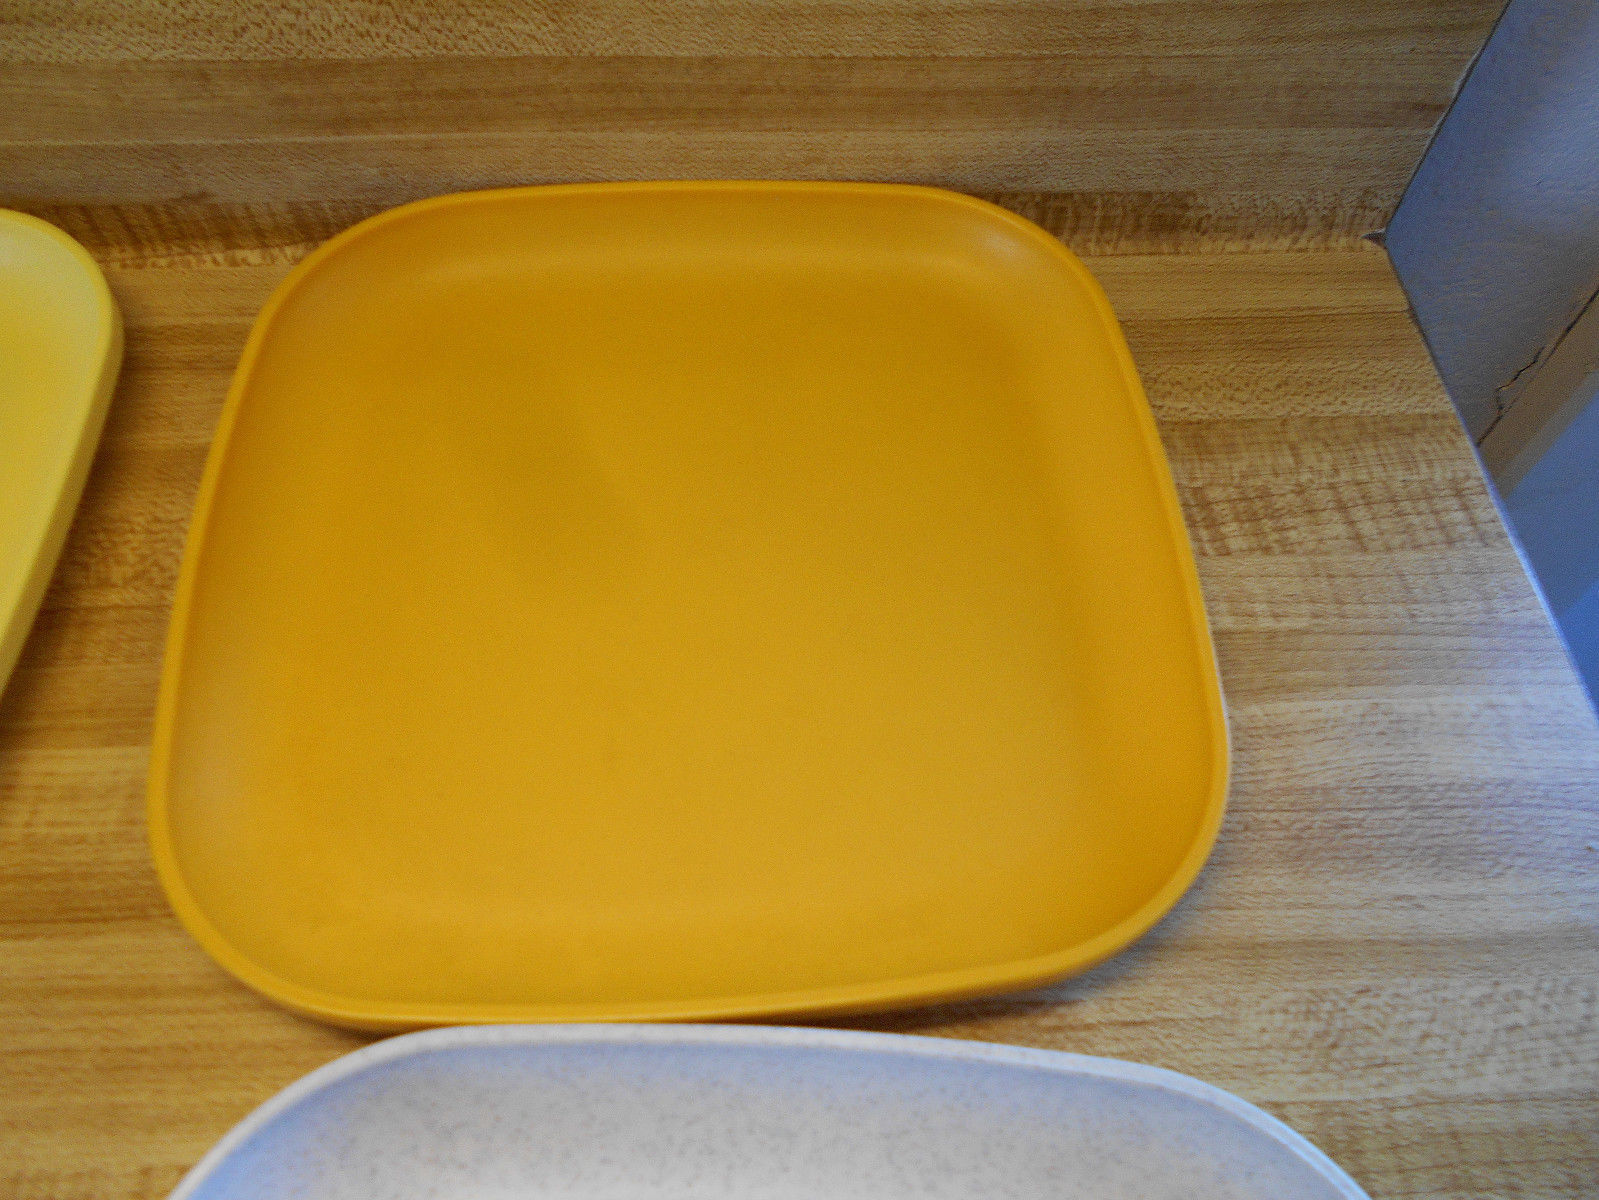 ... tupperware Square plates · tupperware Square plates & tupperware Square plates and 50 similar items